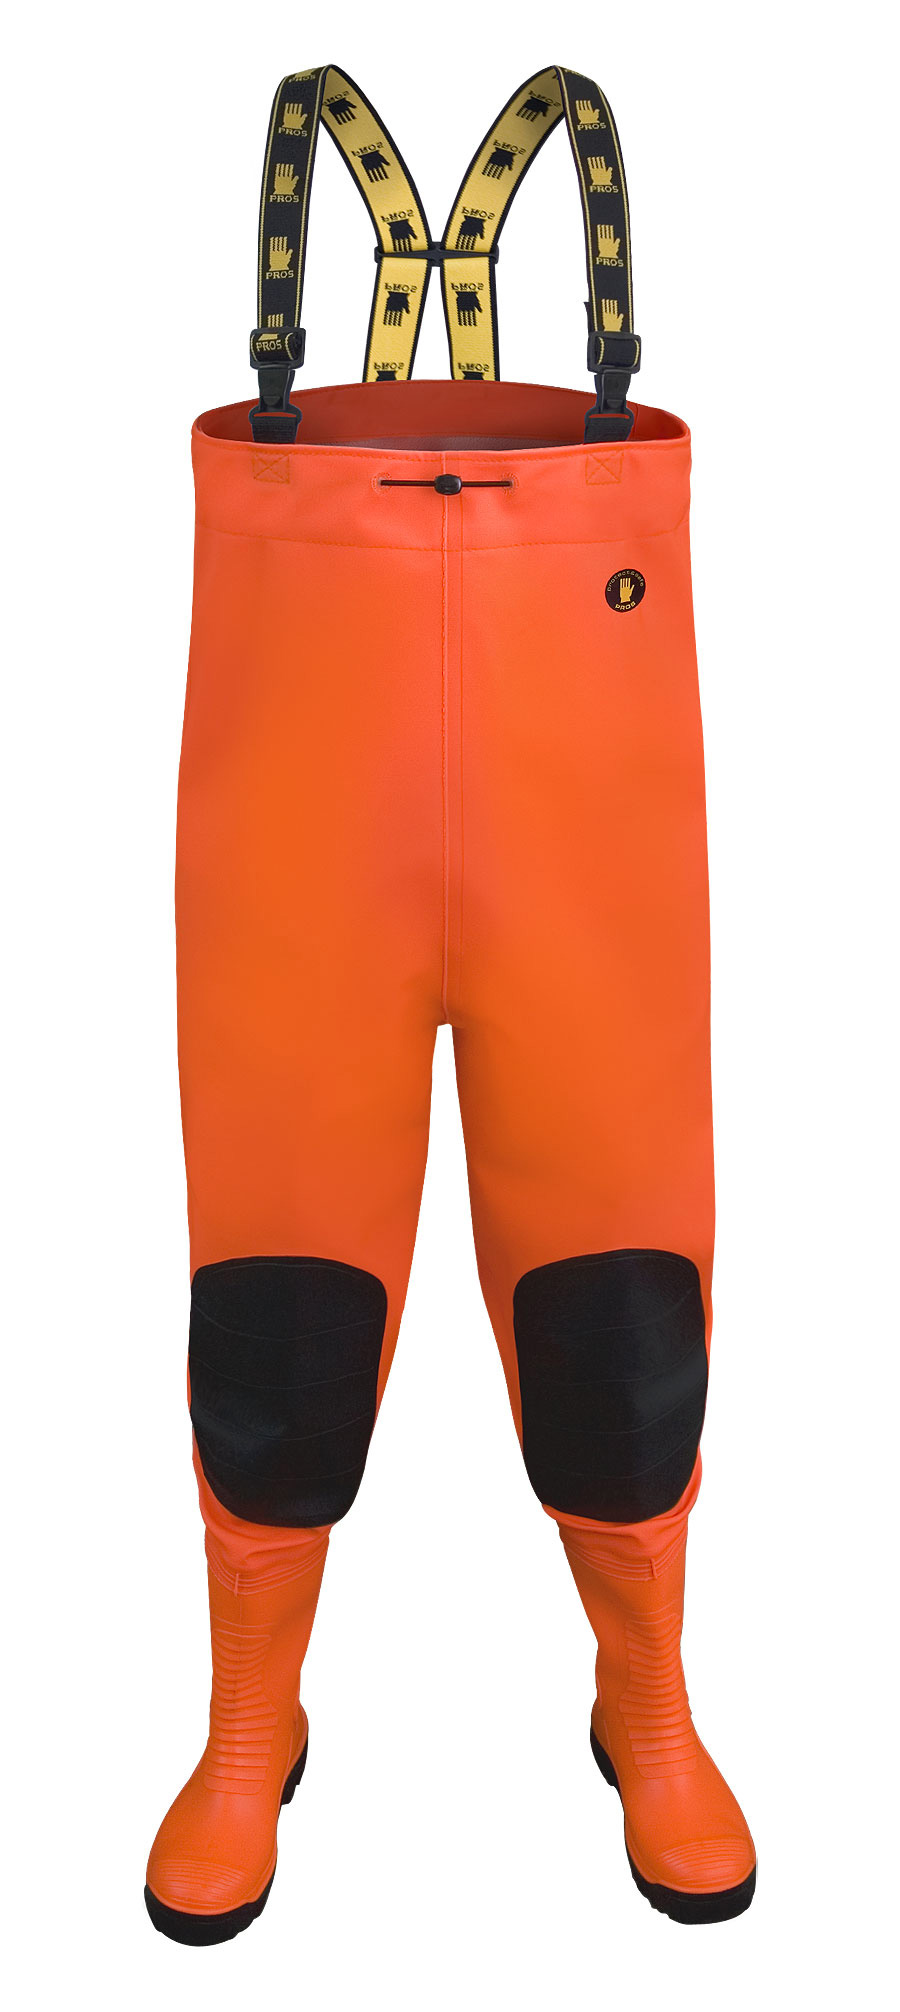 Brodící kalhoty MAX Fluo oranž vel.47    SBM01 Fluo or.  PROS